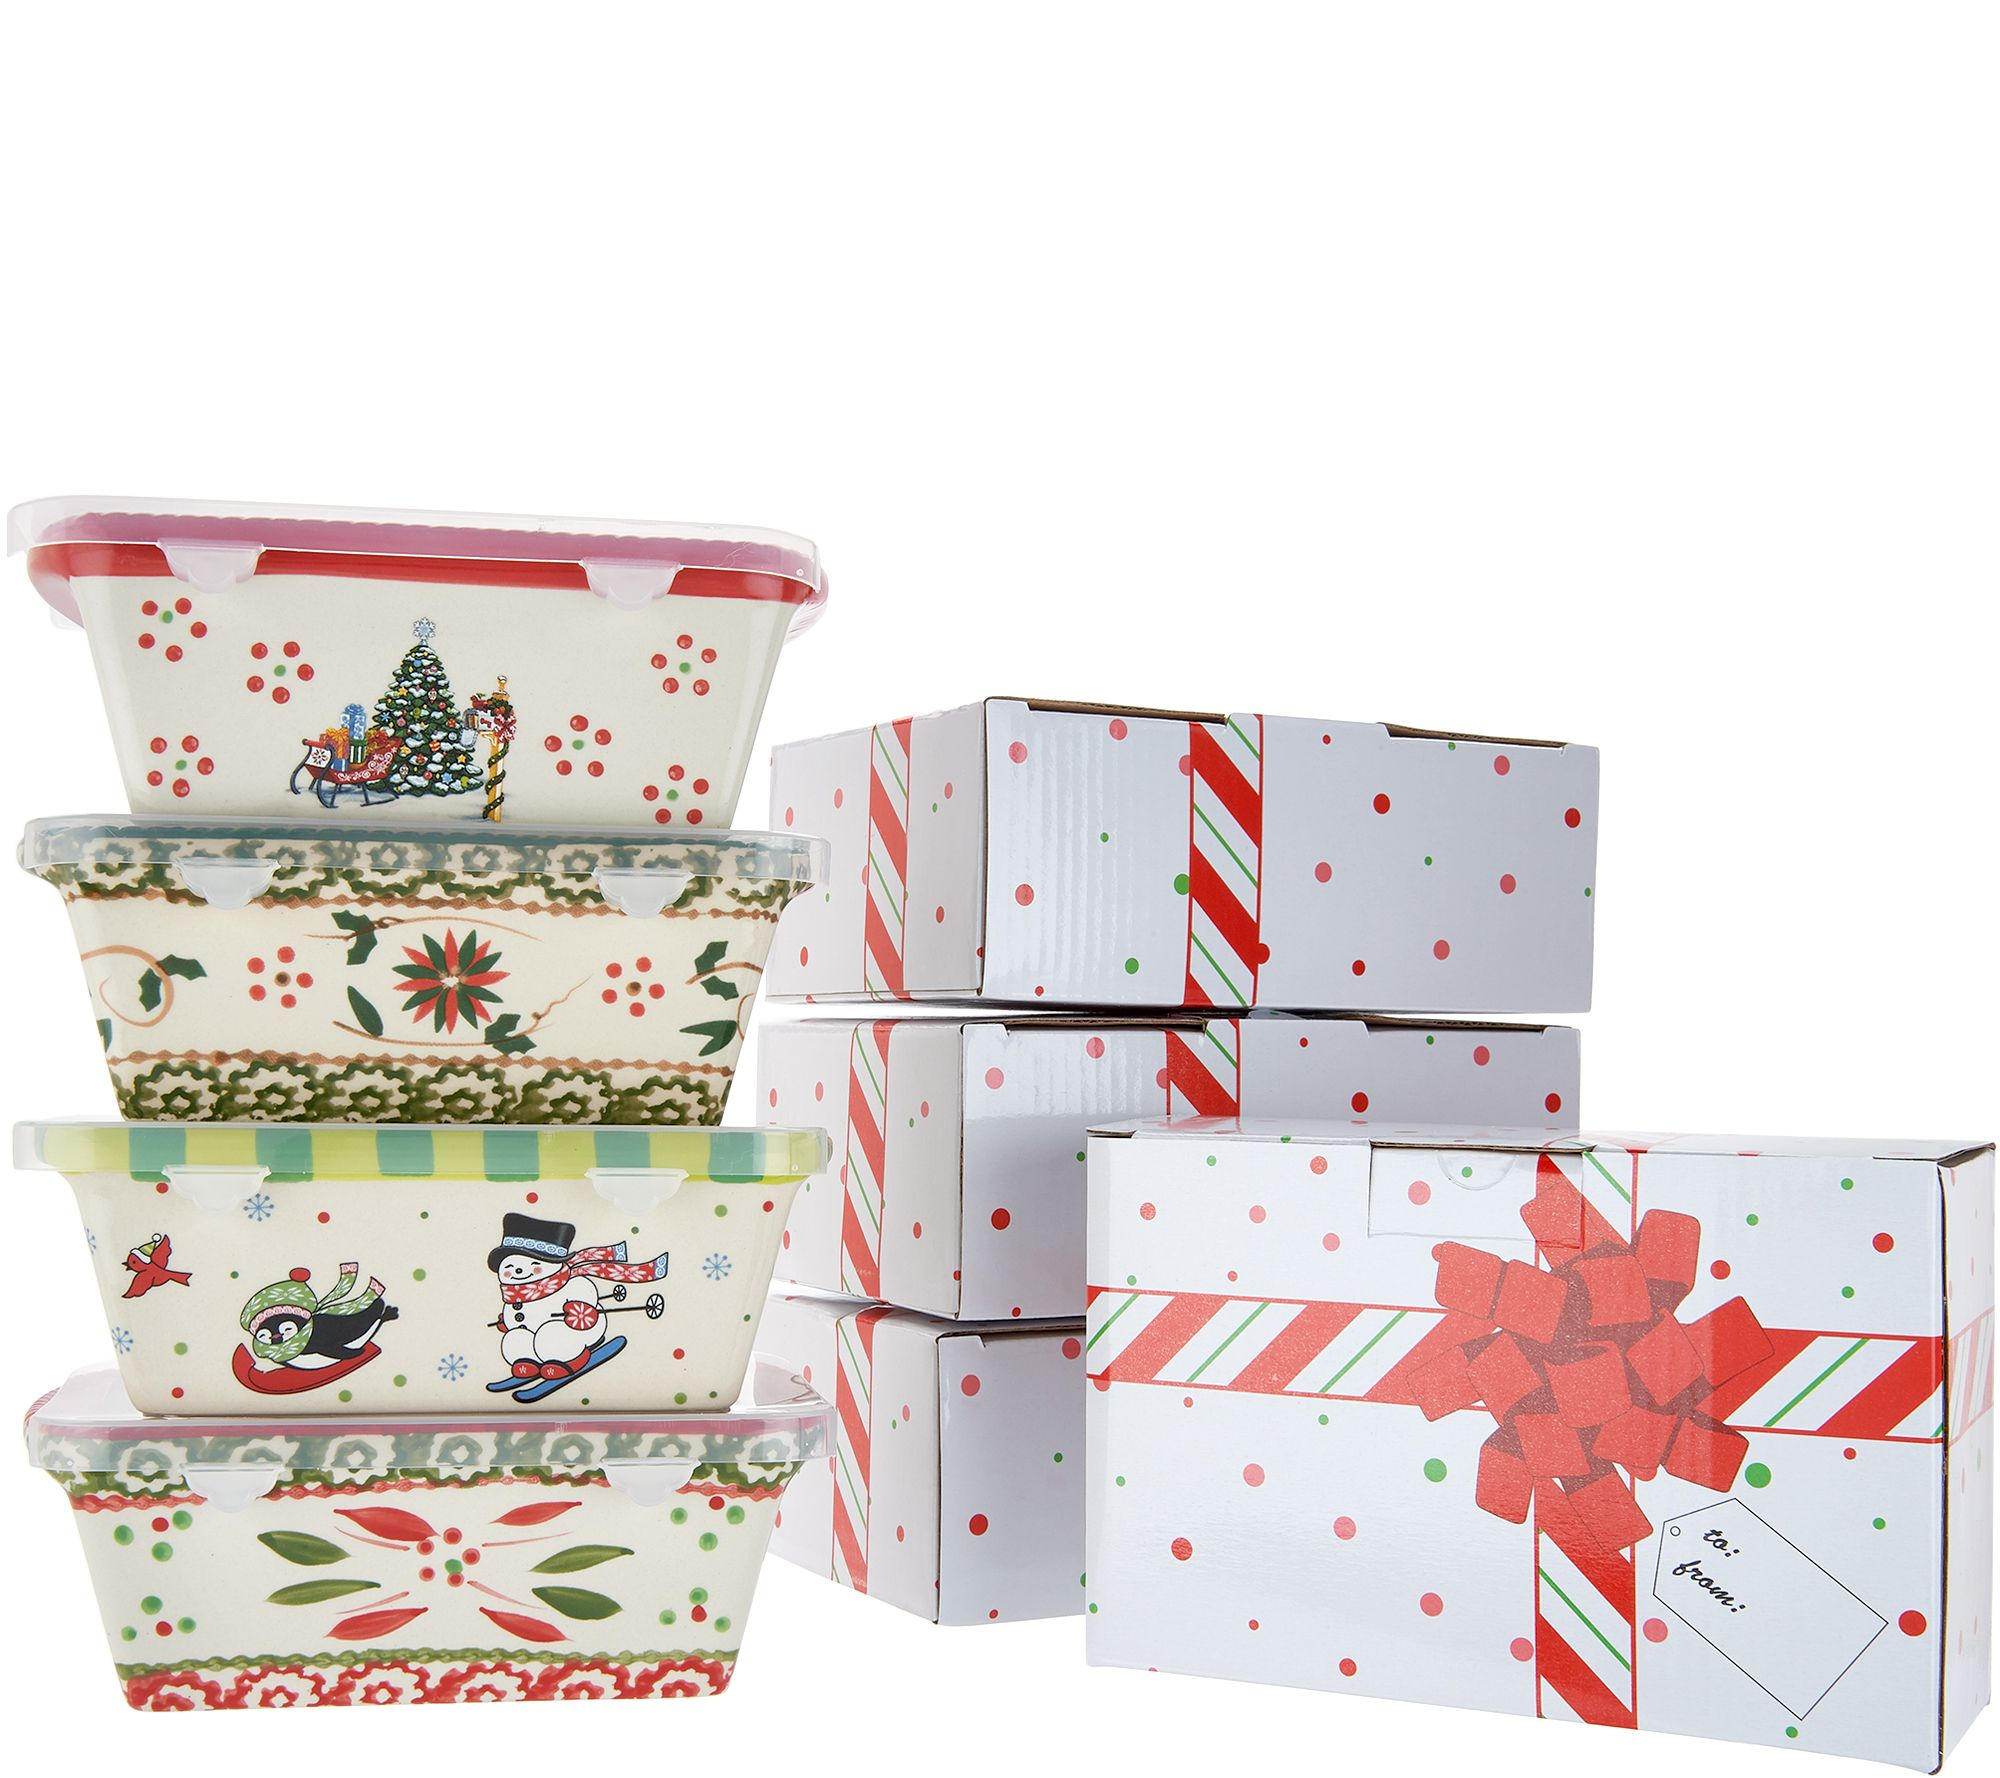 Temp Tations Set Of 4 Holiday Mini Loaf Pans W Gift Boxes Qvc Com